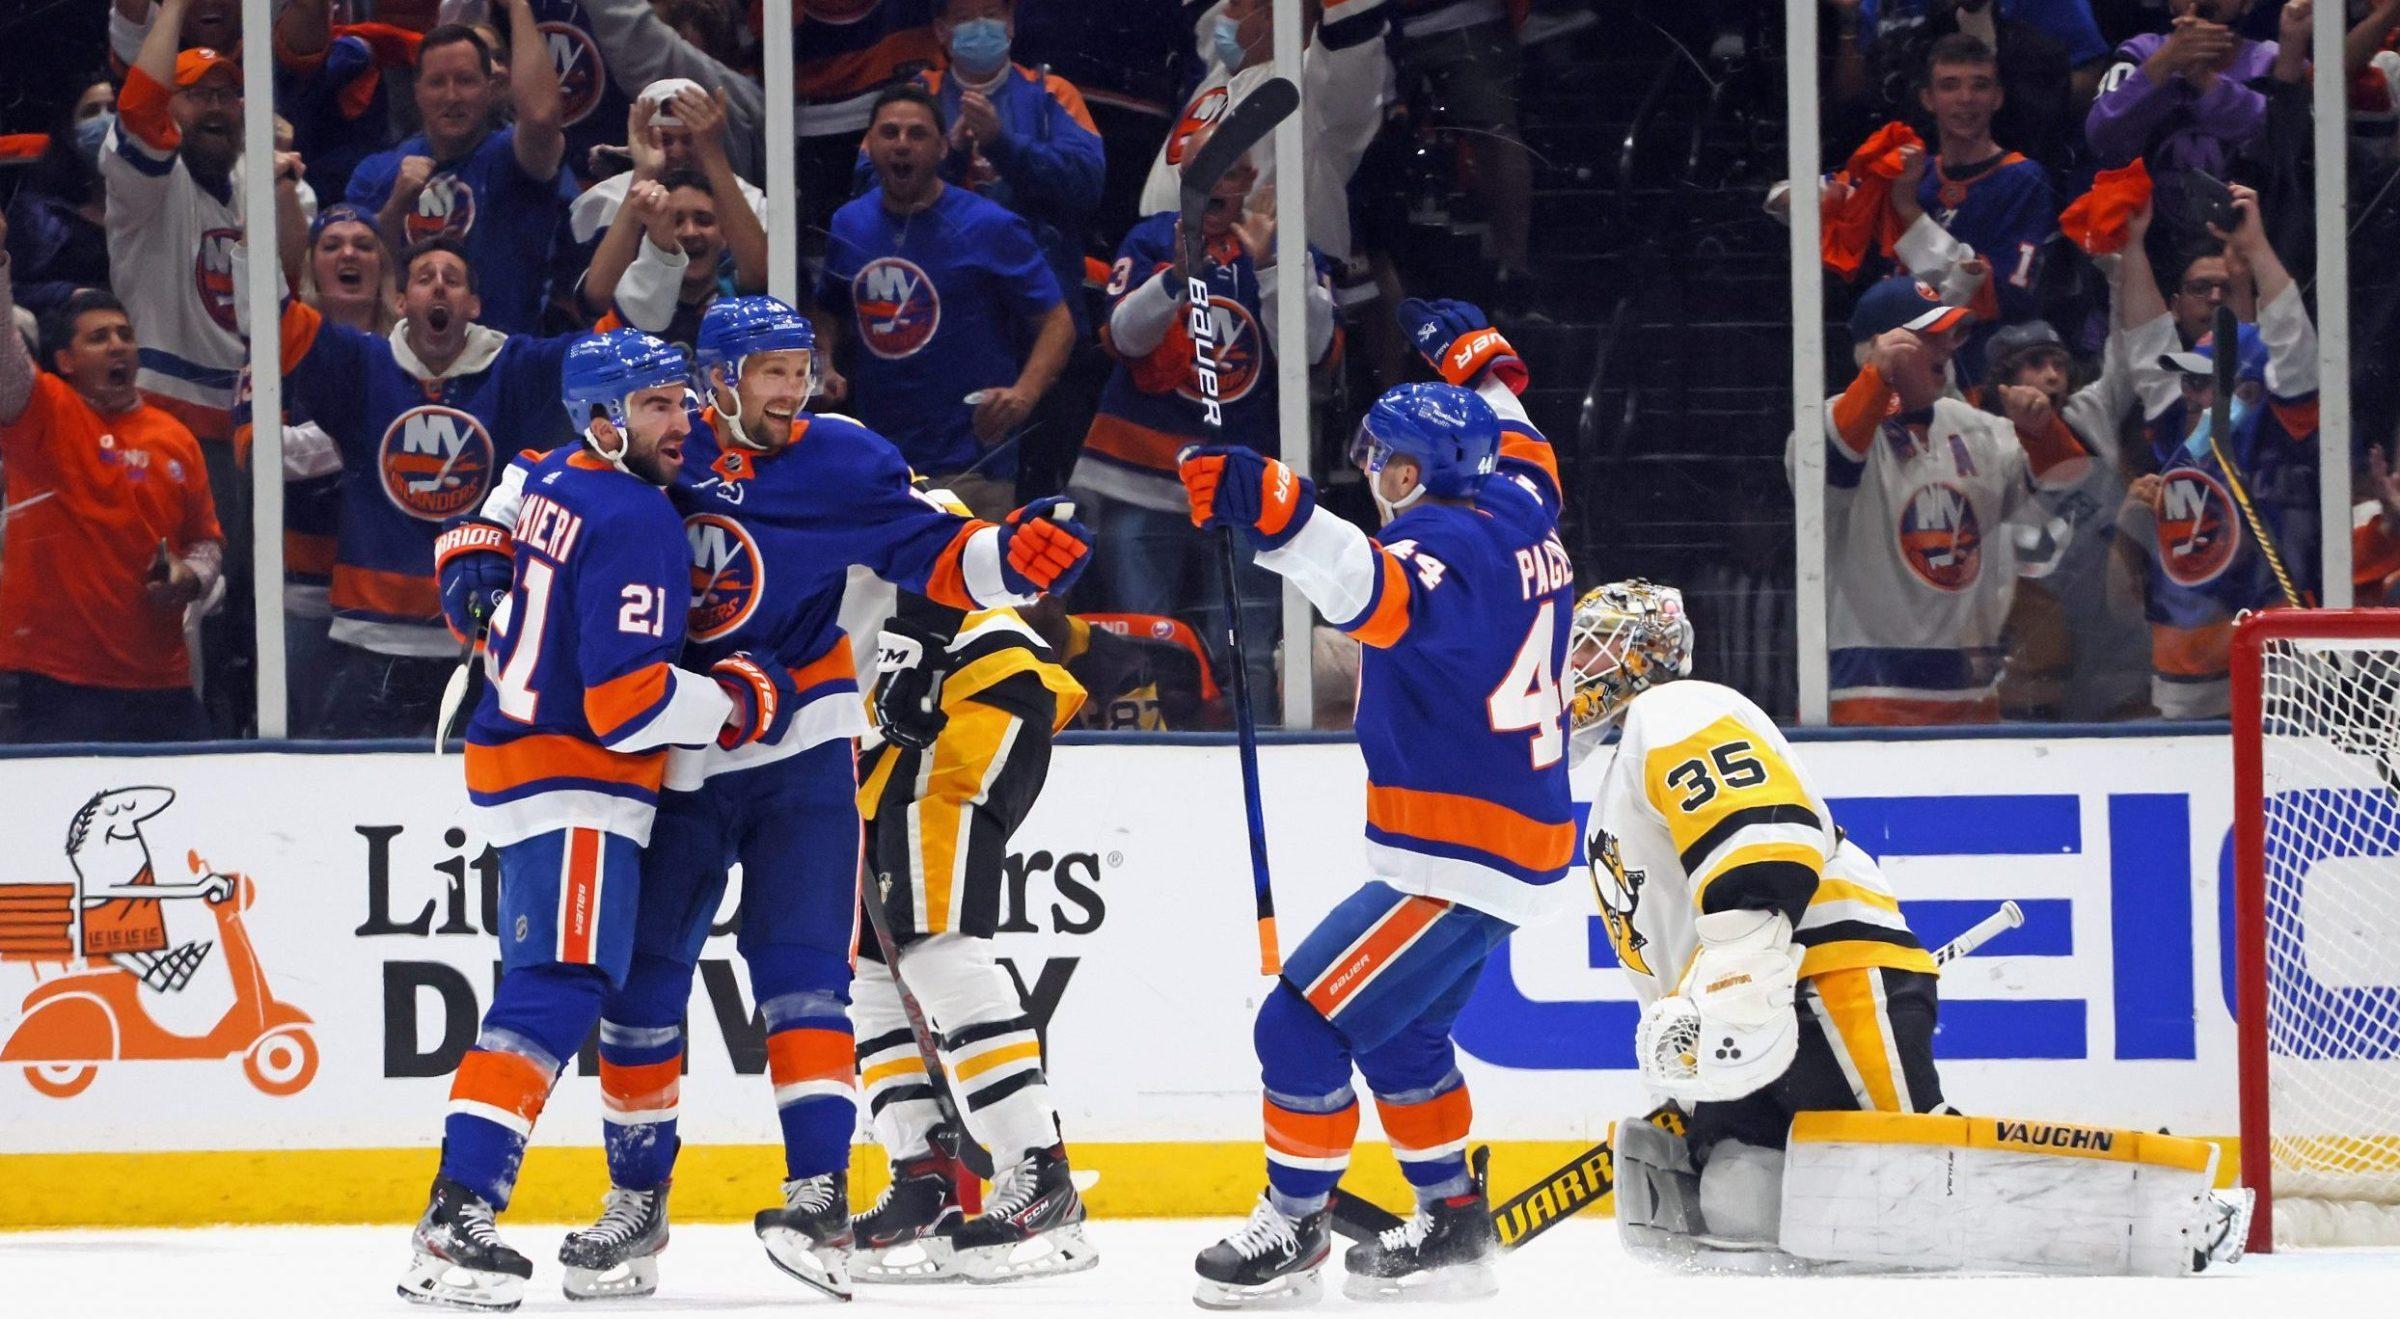 The New York Islanders celebrate a goal